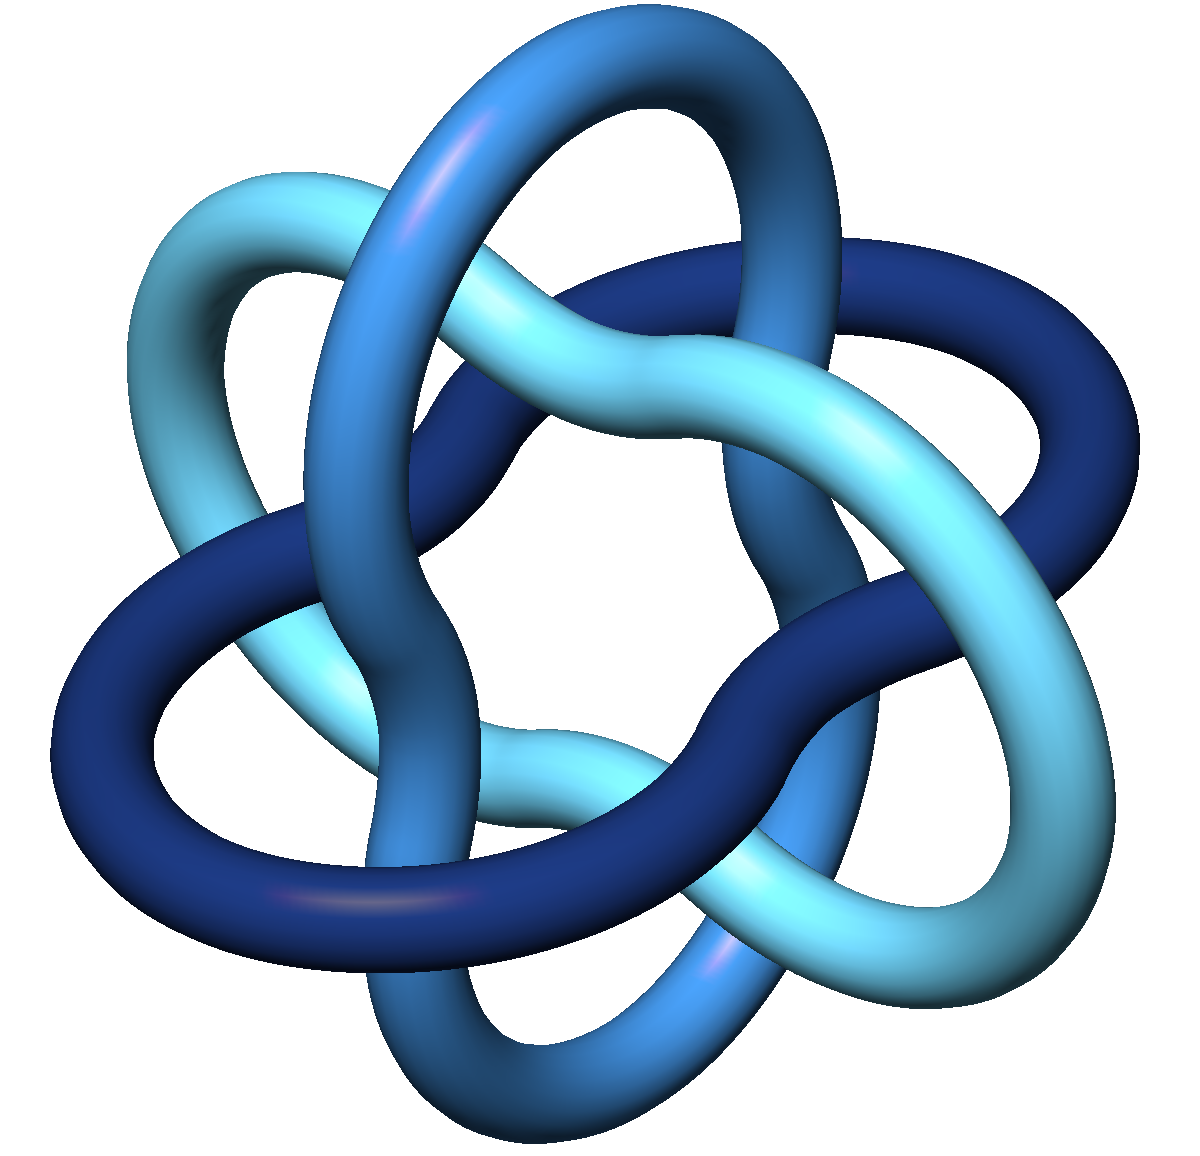 new imu logo based on the tight borromean rings